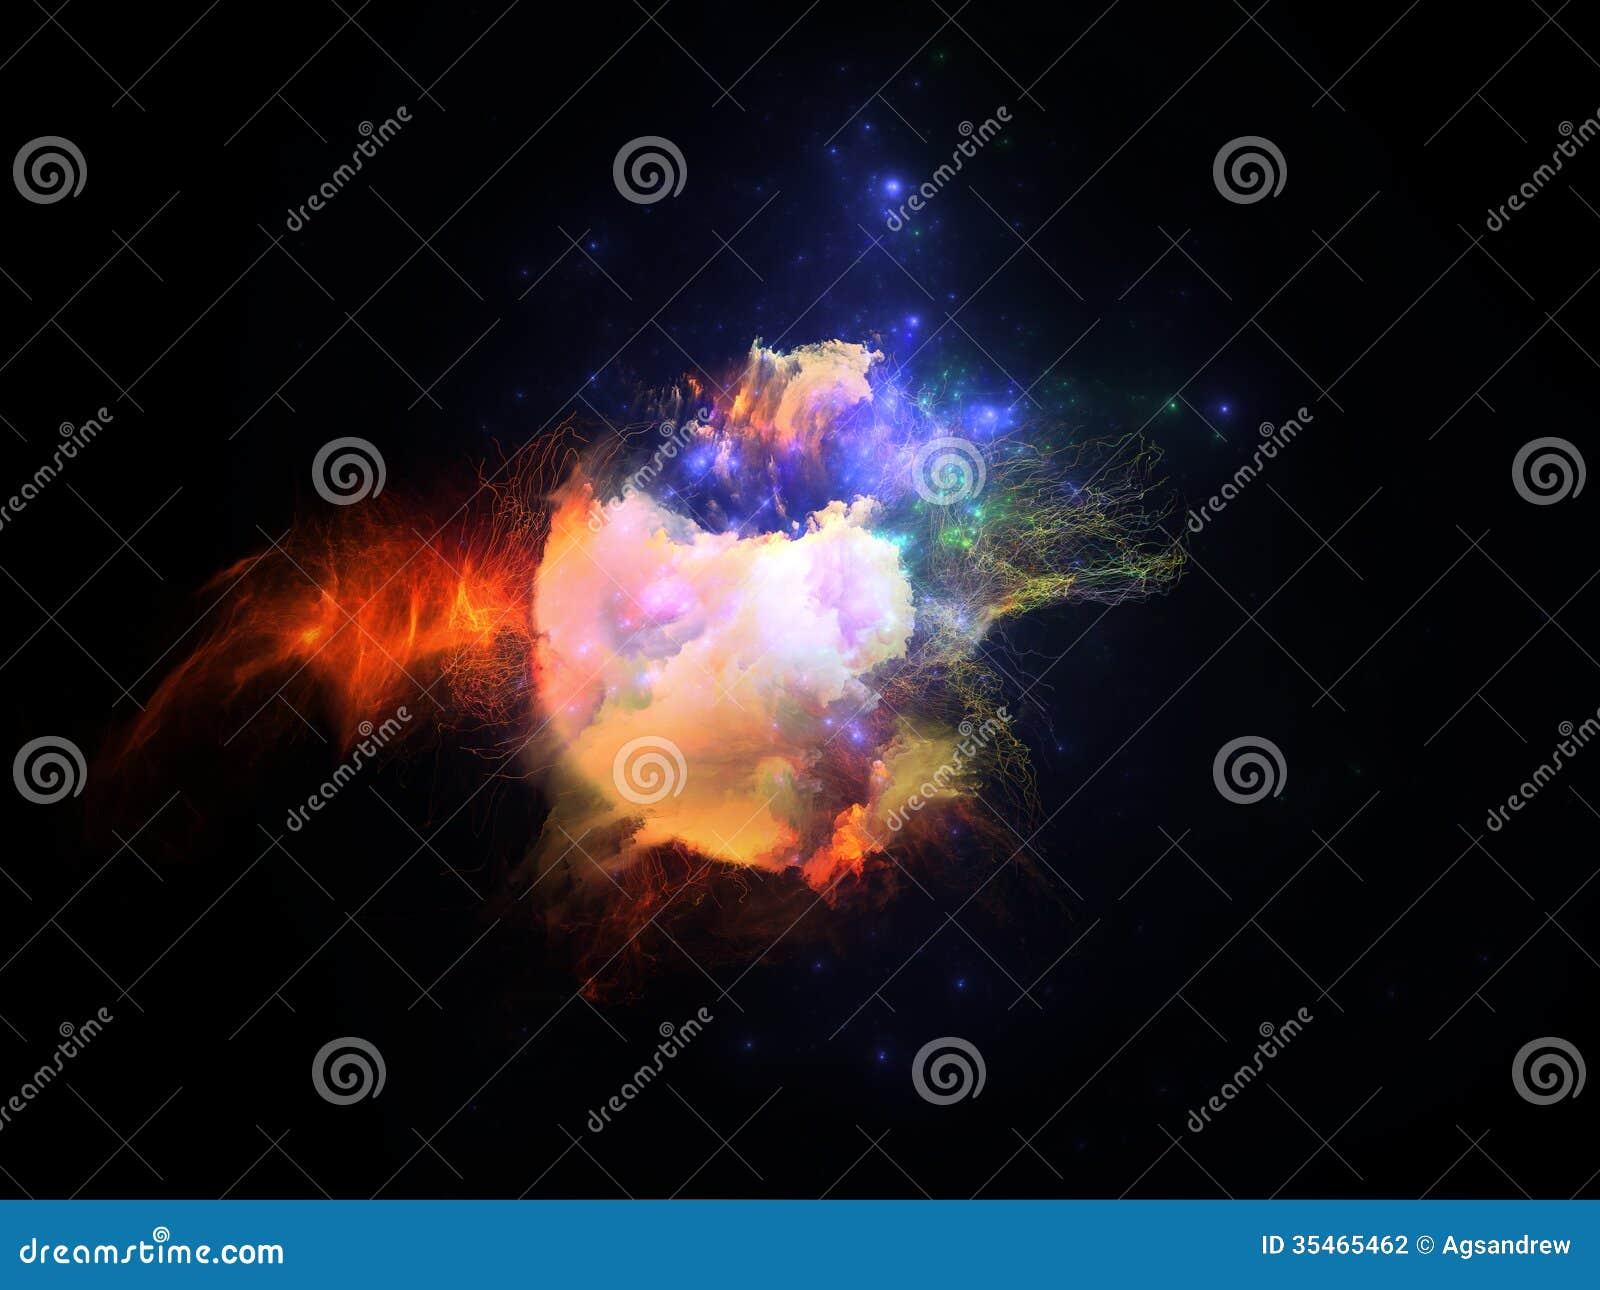 Stock Photography Virtual Fractal Nebula Series Backdrop Textures Ligh...